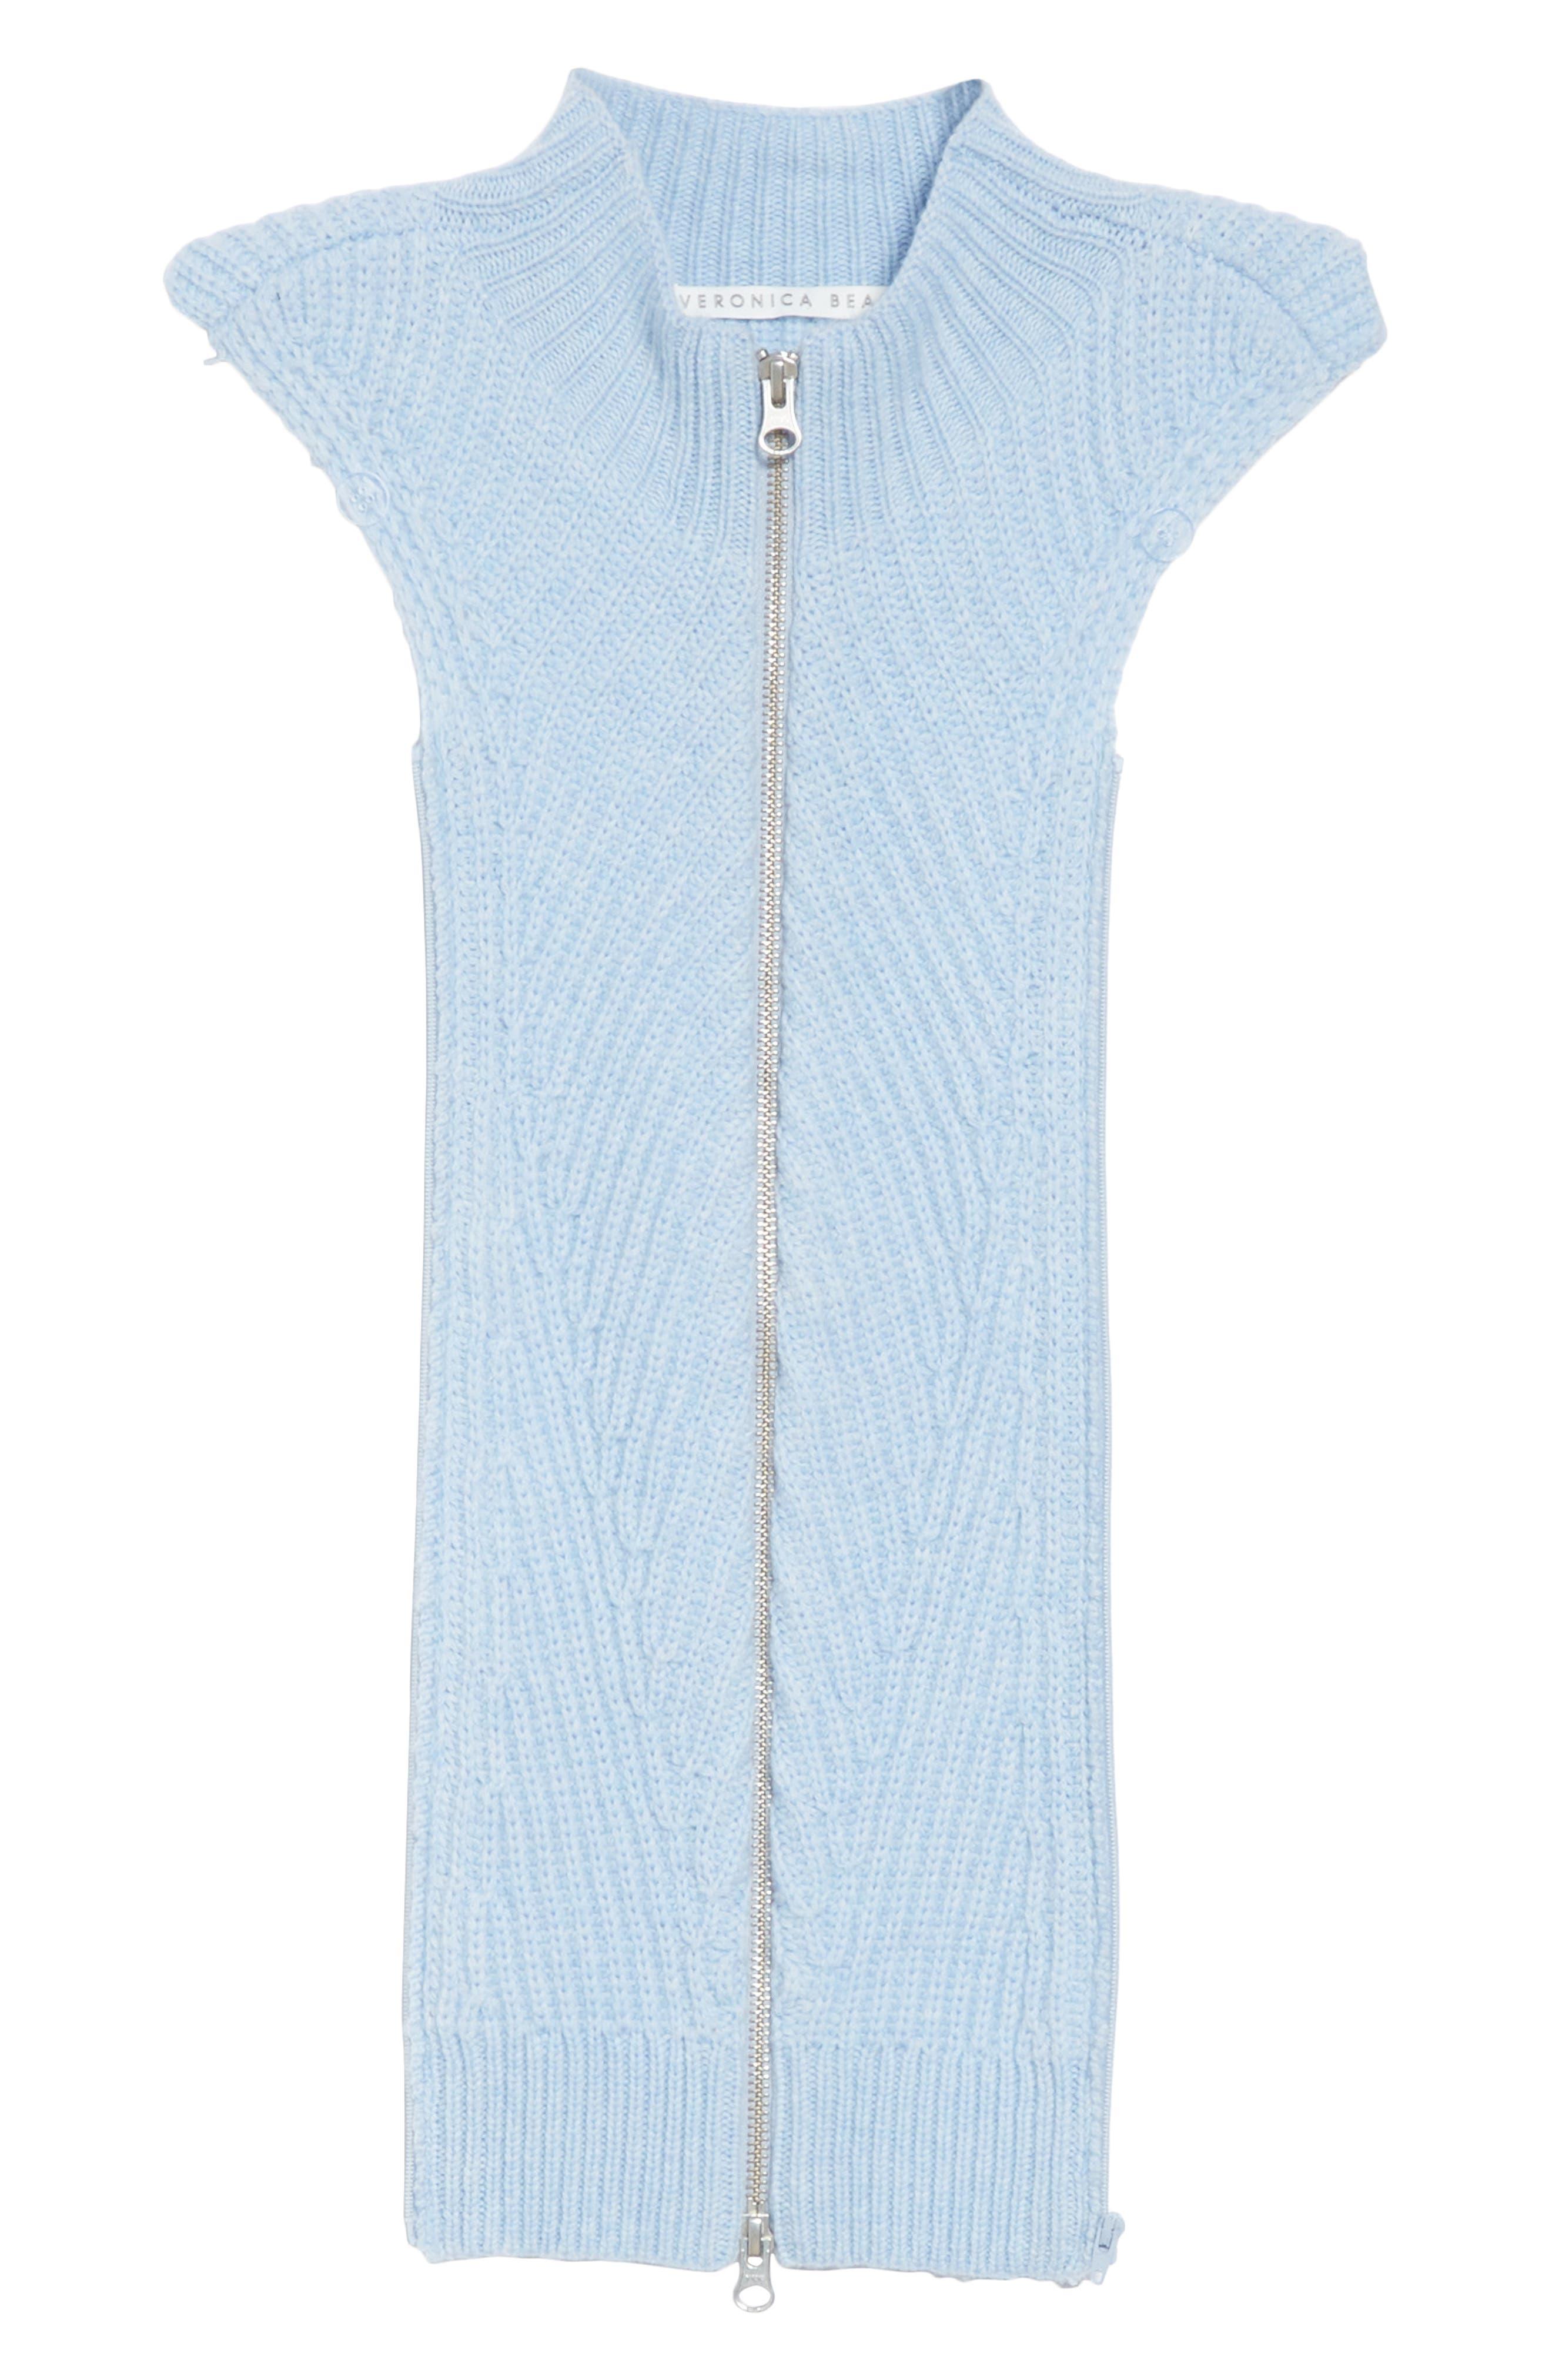 Veronica Beard Flori Merino Wool & Cashmere Dickey, Size One Size - Blue